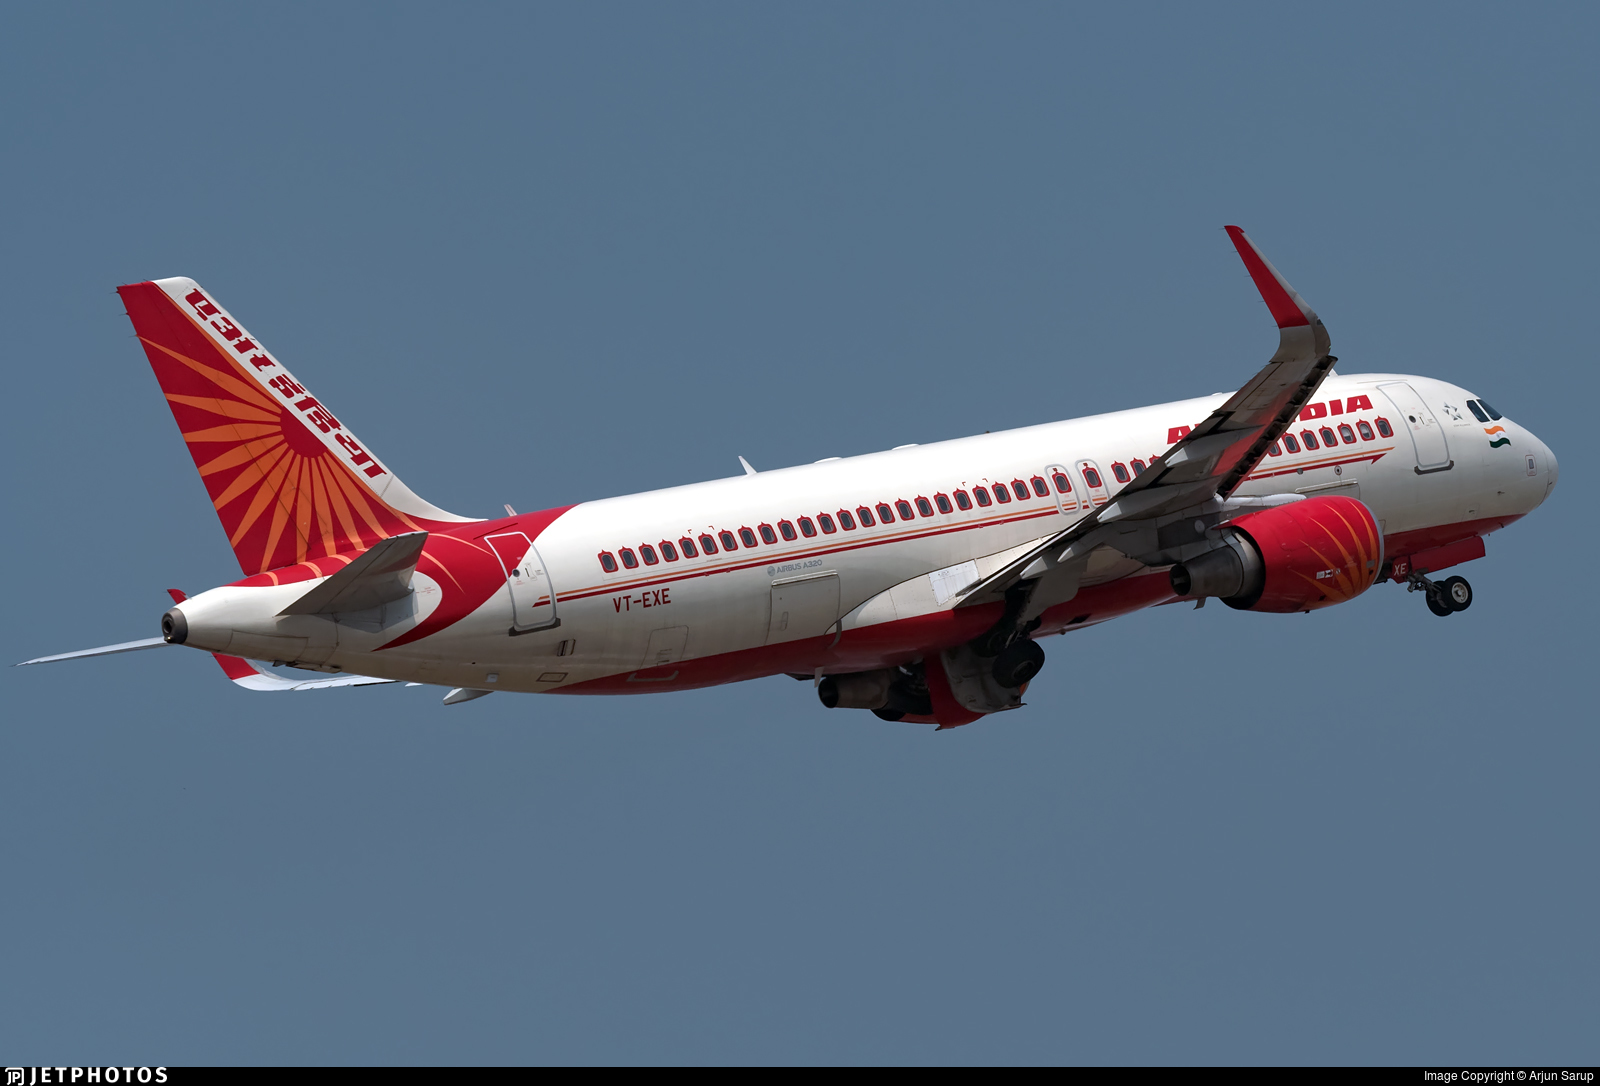 VT-EXE - Airbus A320-214 - Air India